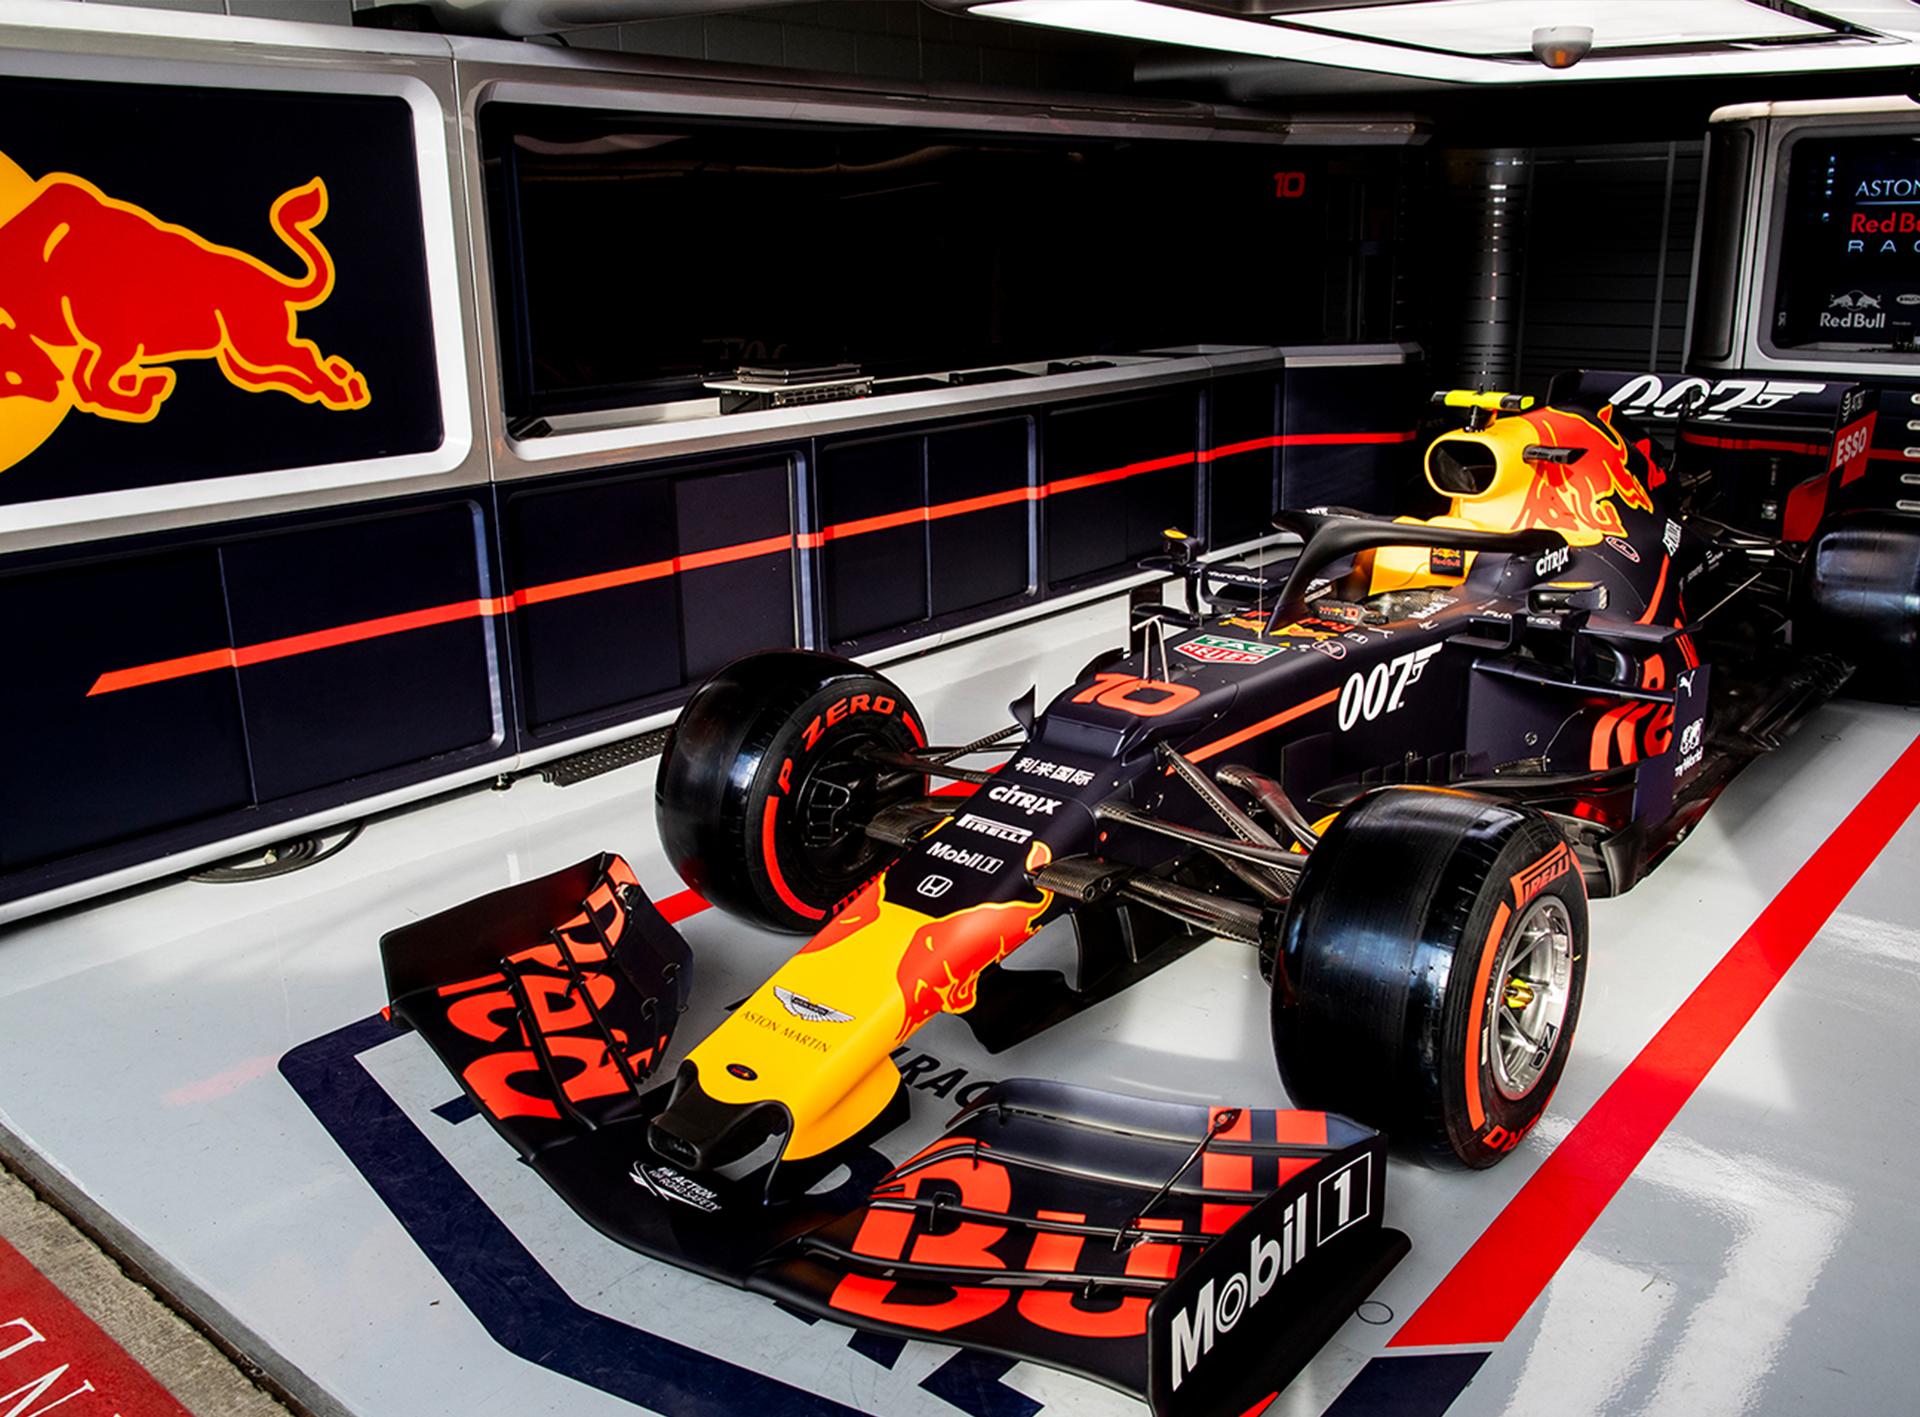 007 And Aston Martin Red Bull Racing James Bond 007